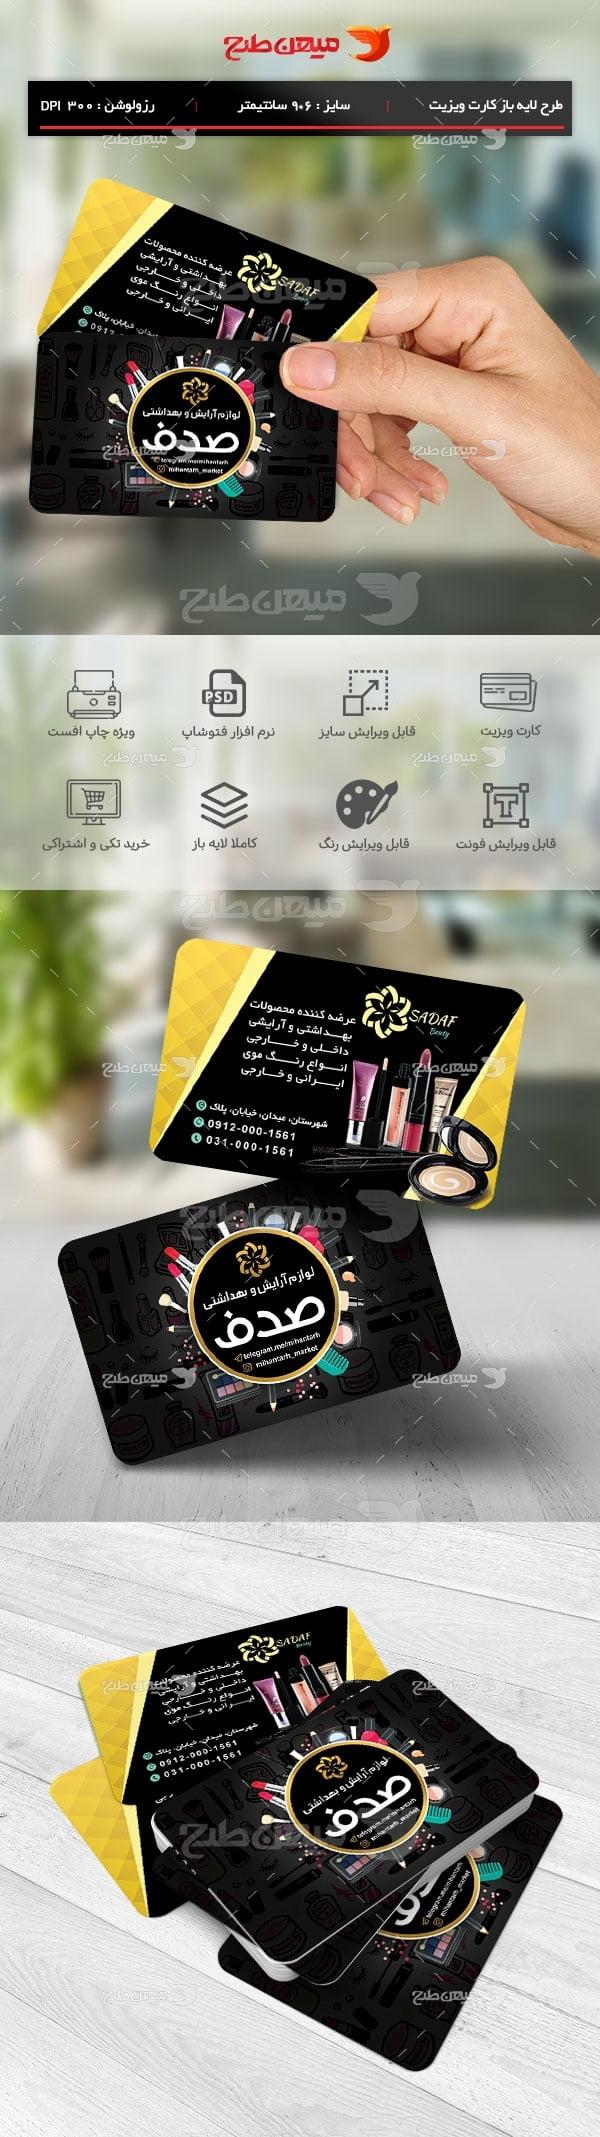 طرح لایه باز کارت ویزیت لوازم آرایشی و بهداشتی صدف